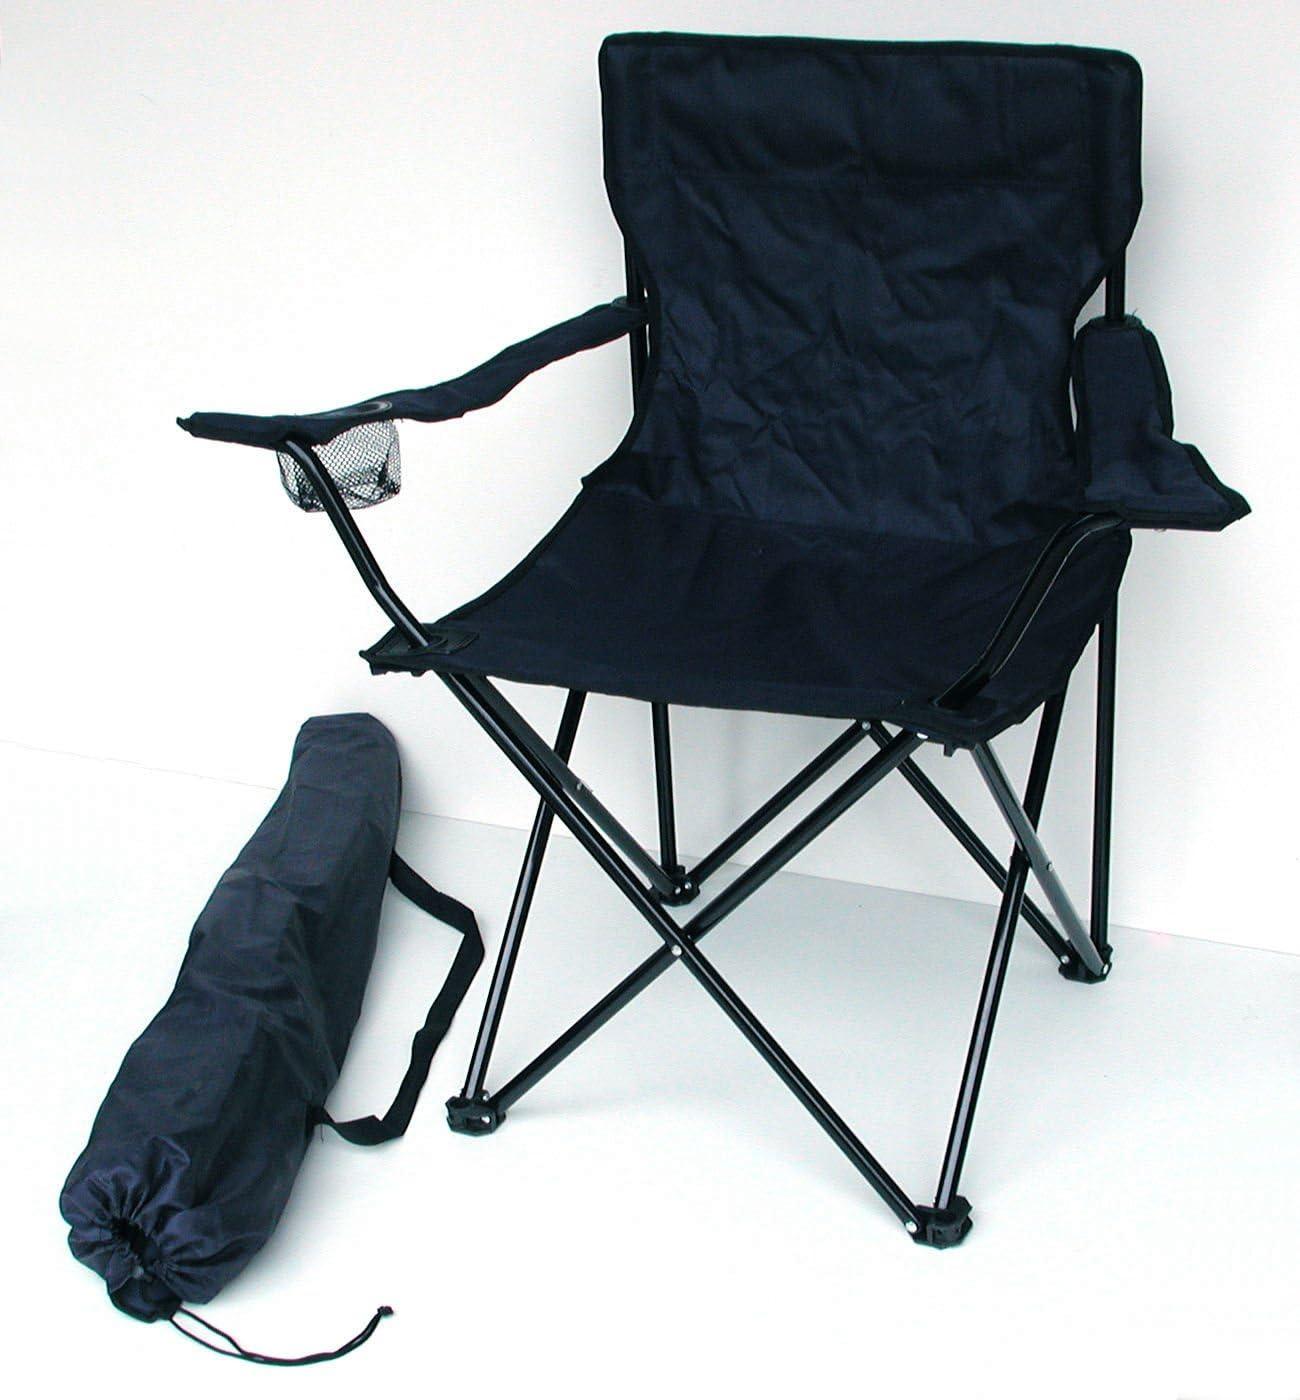 Outwell Campingstuhl Blau Gartenstuhl Klappstuhl Anglerstuhl Faltstuhl Stuhl